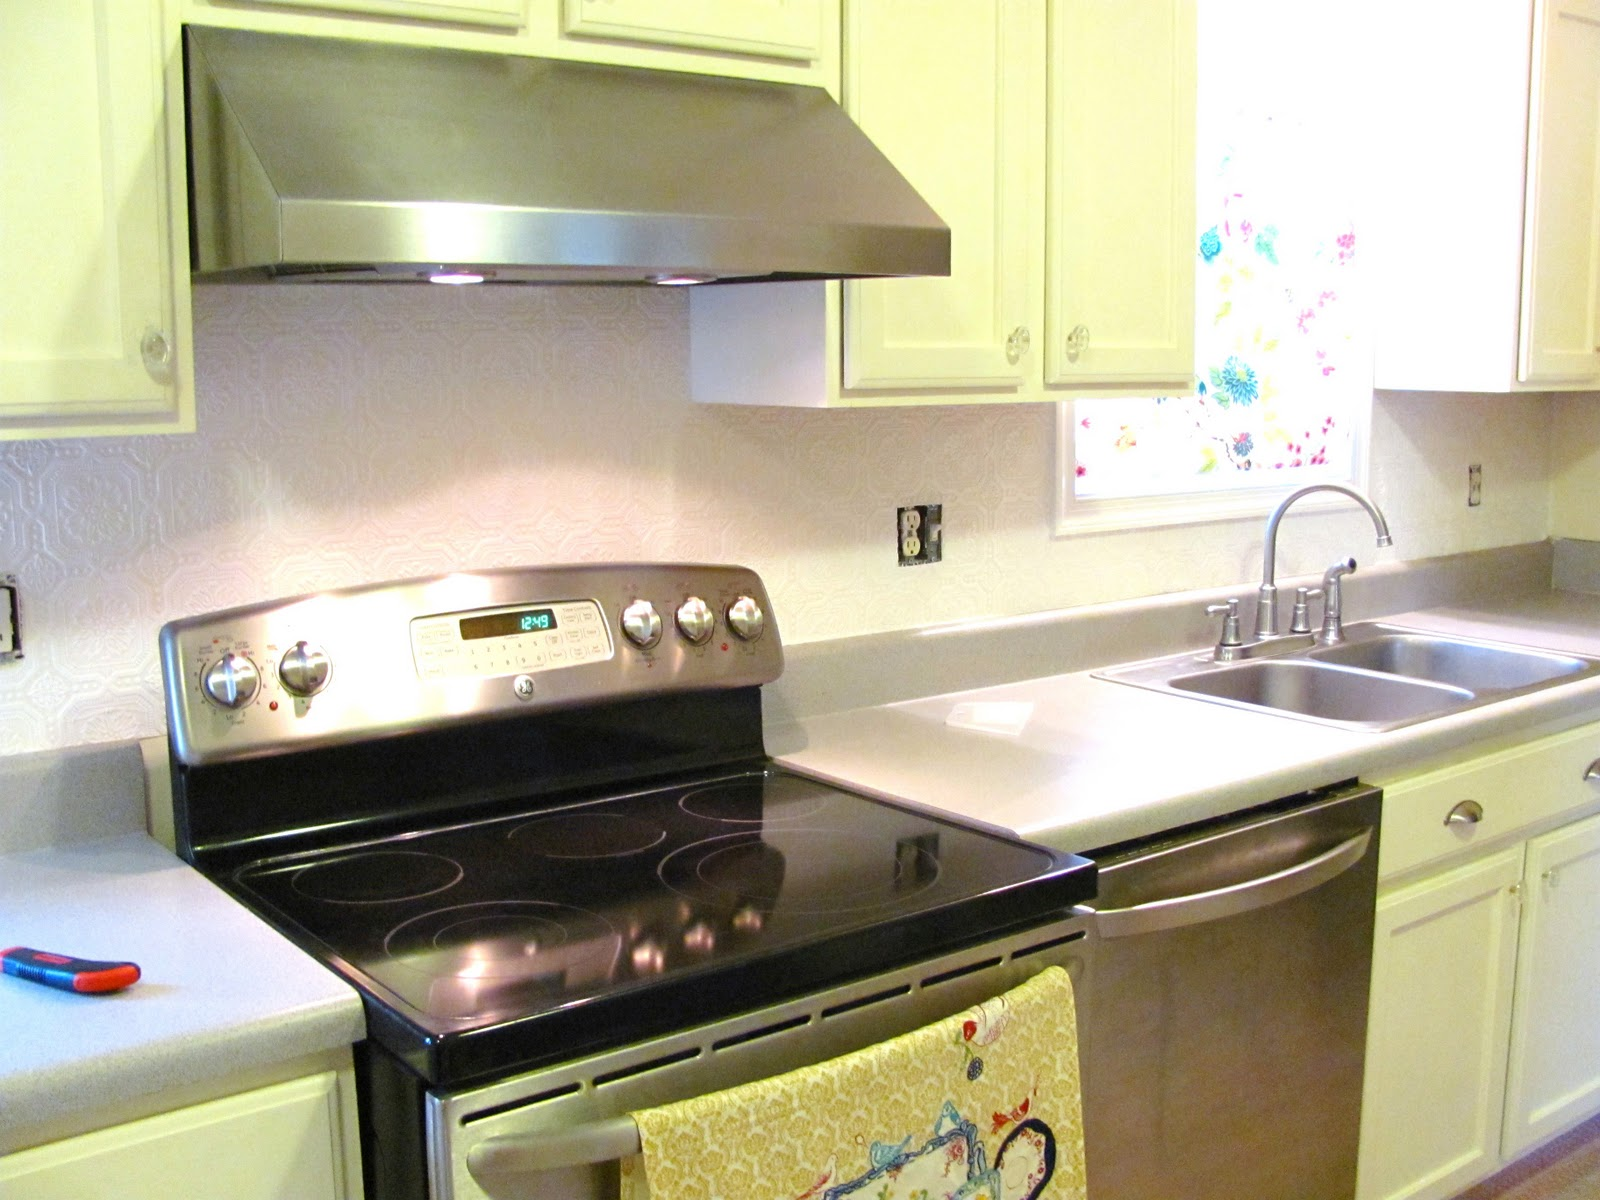 vinyl wallpaper kitchen backsplash brushes silver lining decor d i y part 1